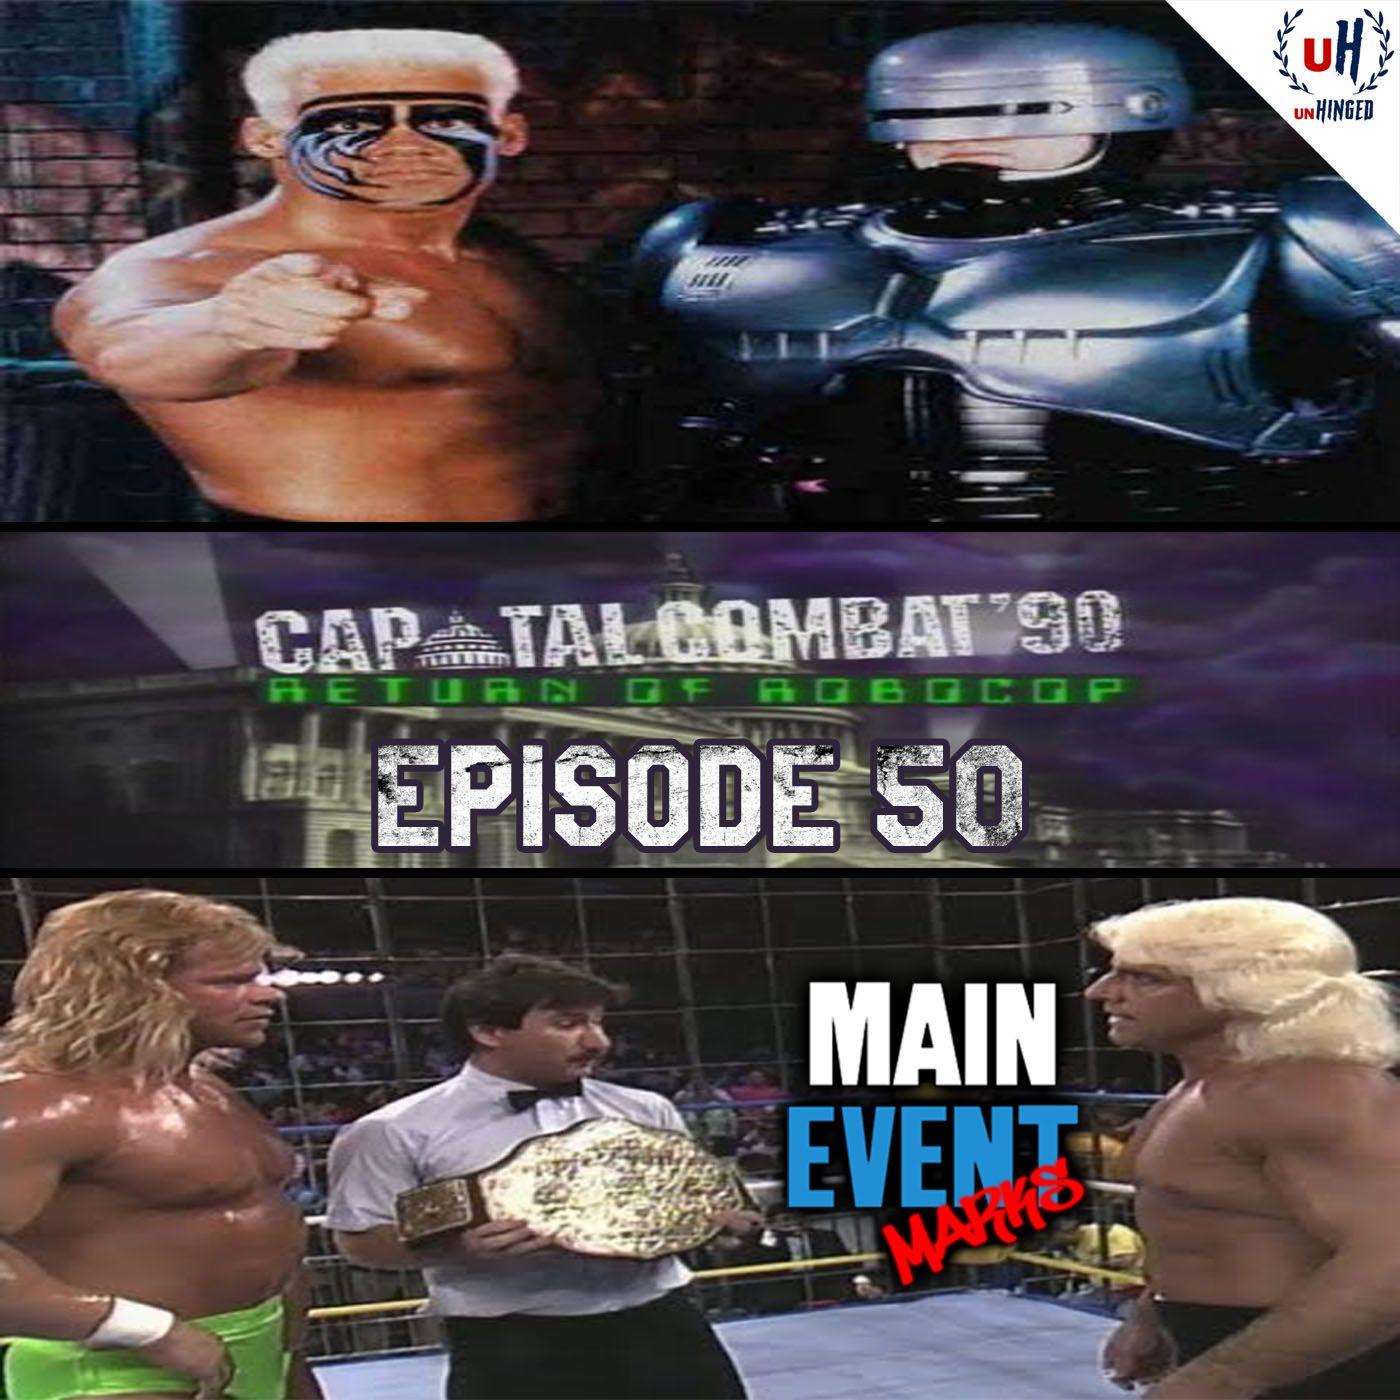 Episode 50: NWA Capital Combat 1990 (The Return of RoboCop)